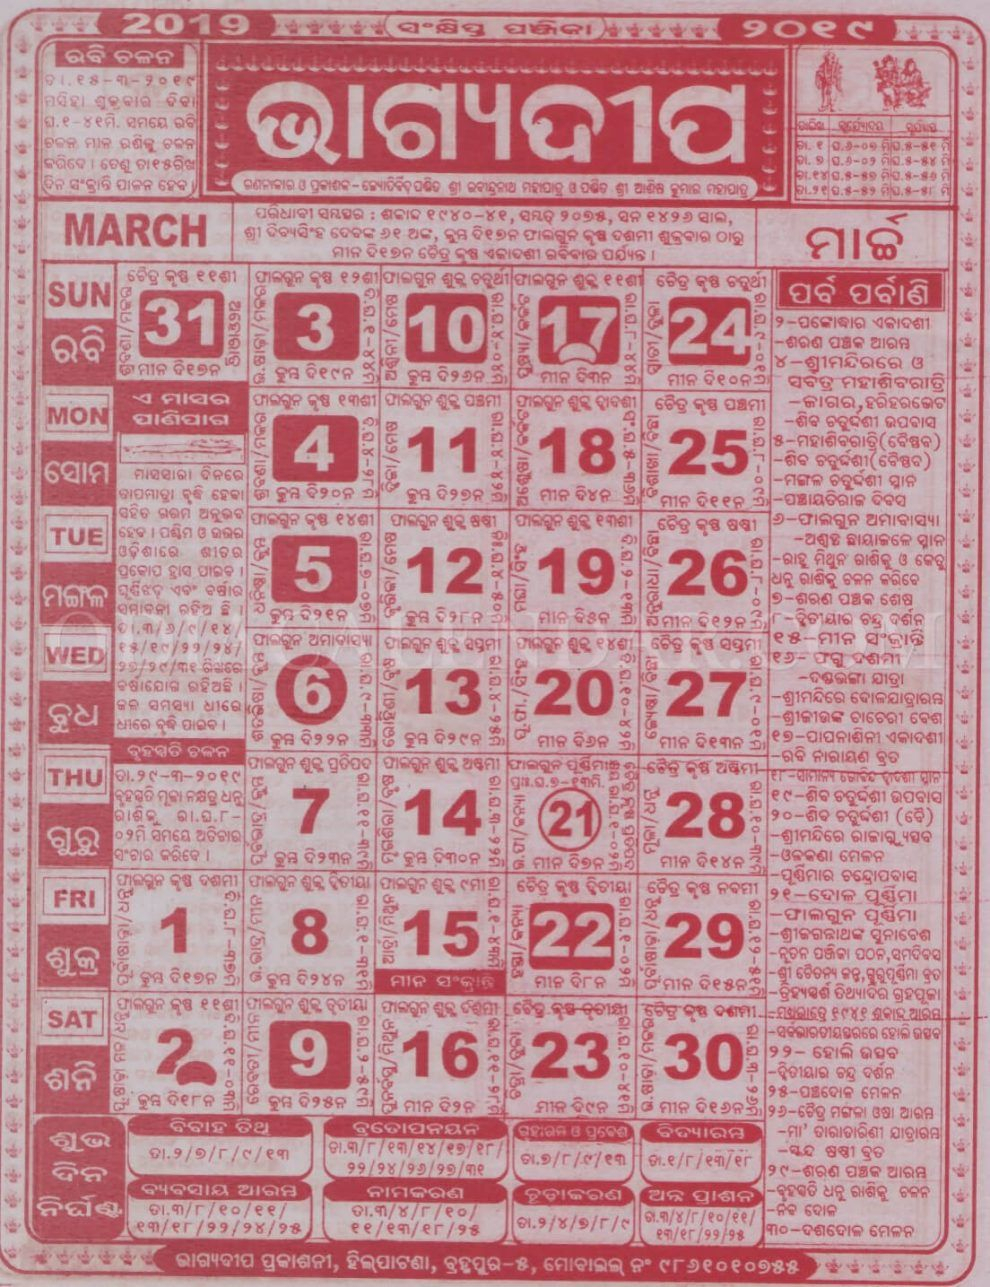 Bhagyadeep Odia Calendar 2019 – Free Odia Panjika (App Book in Bhagyadipa Odia Calendar 2020